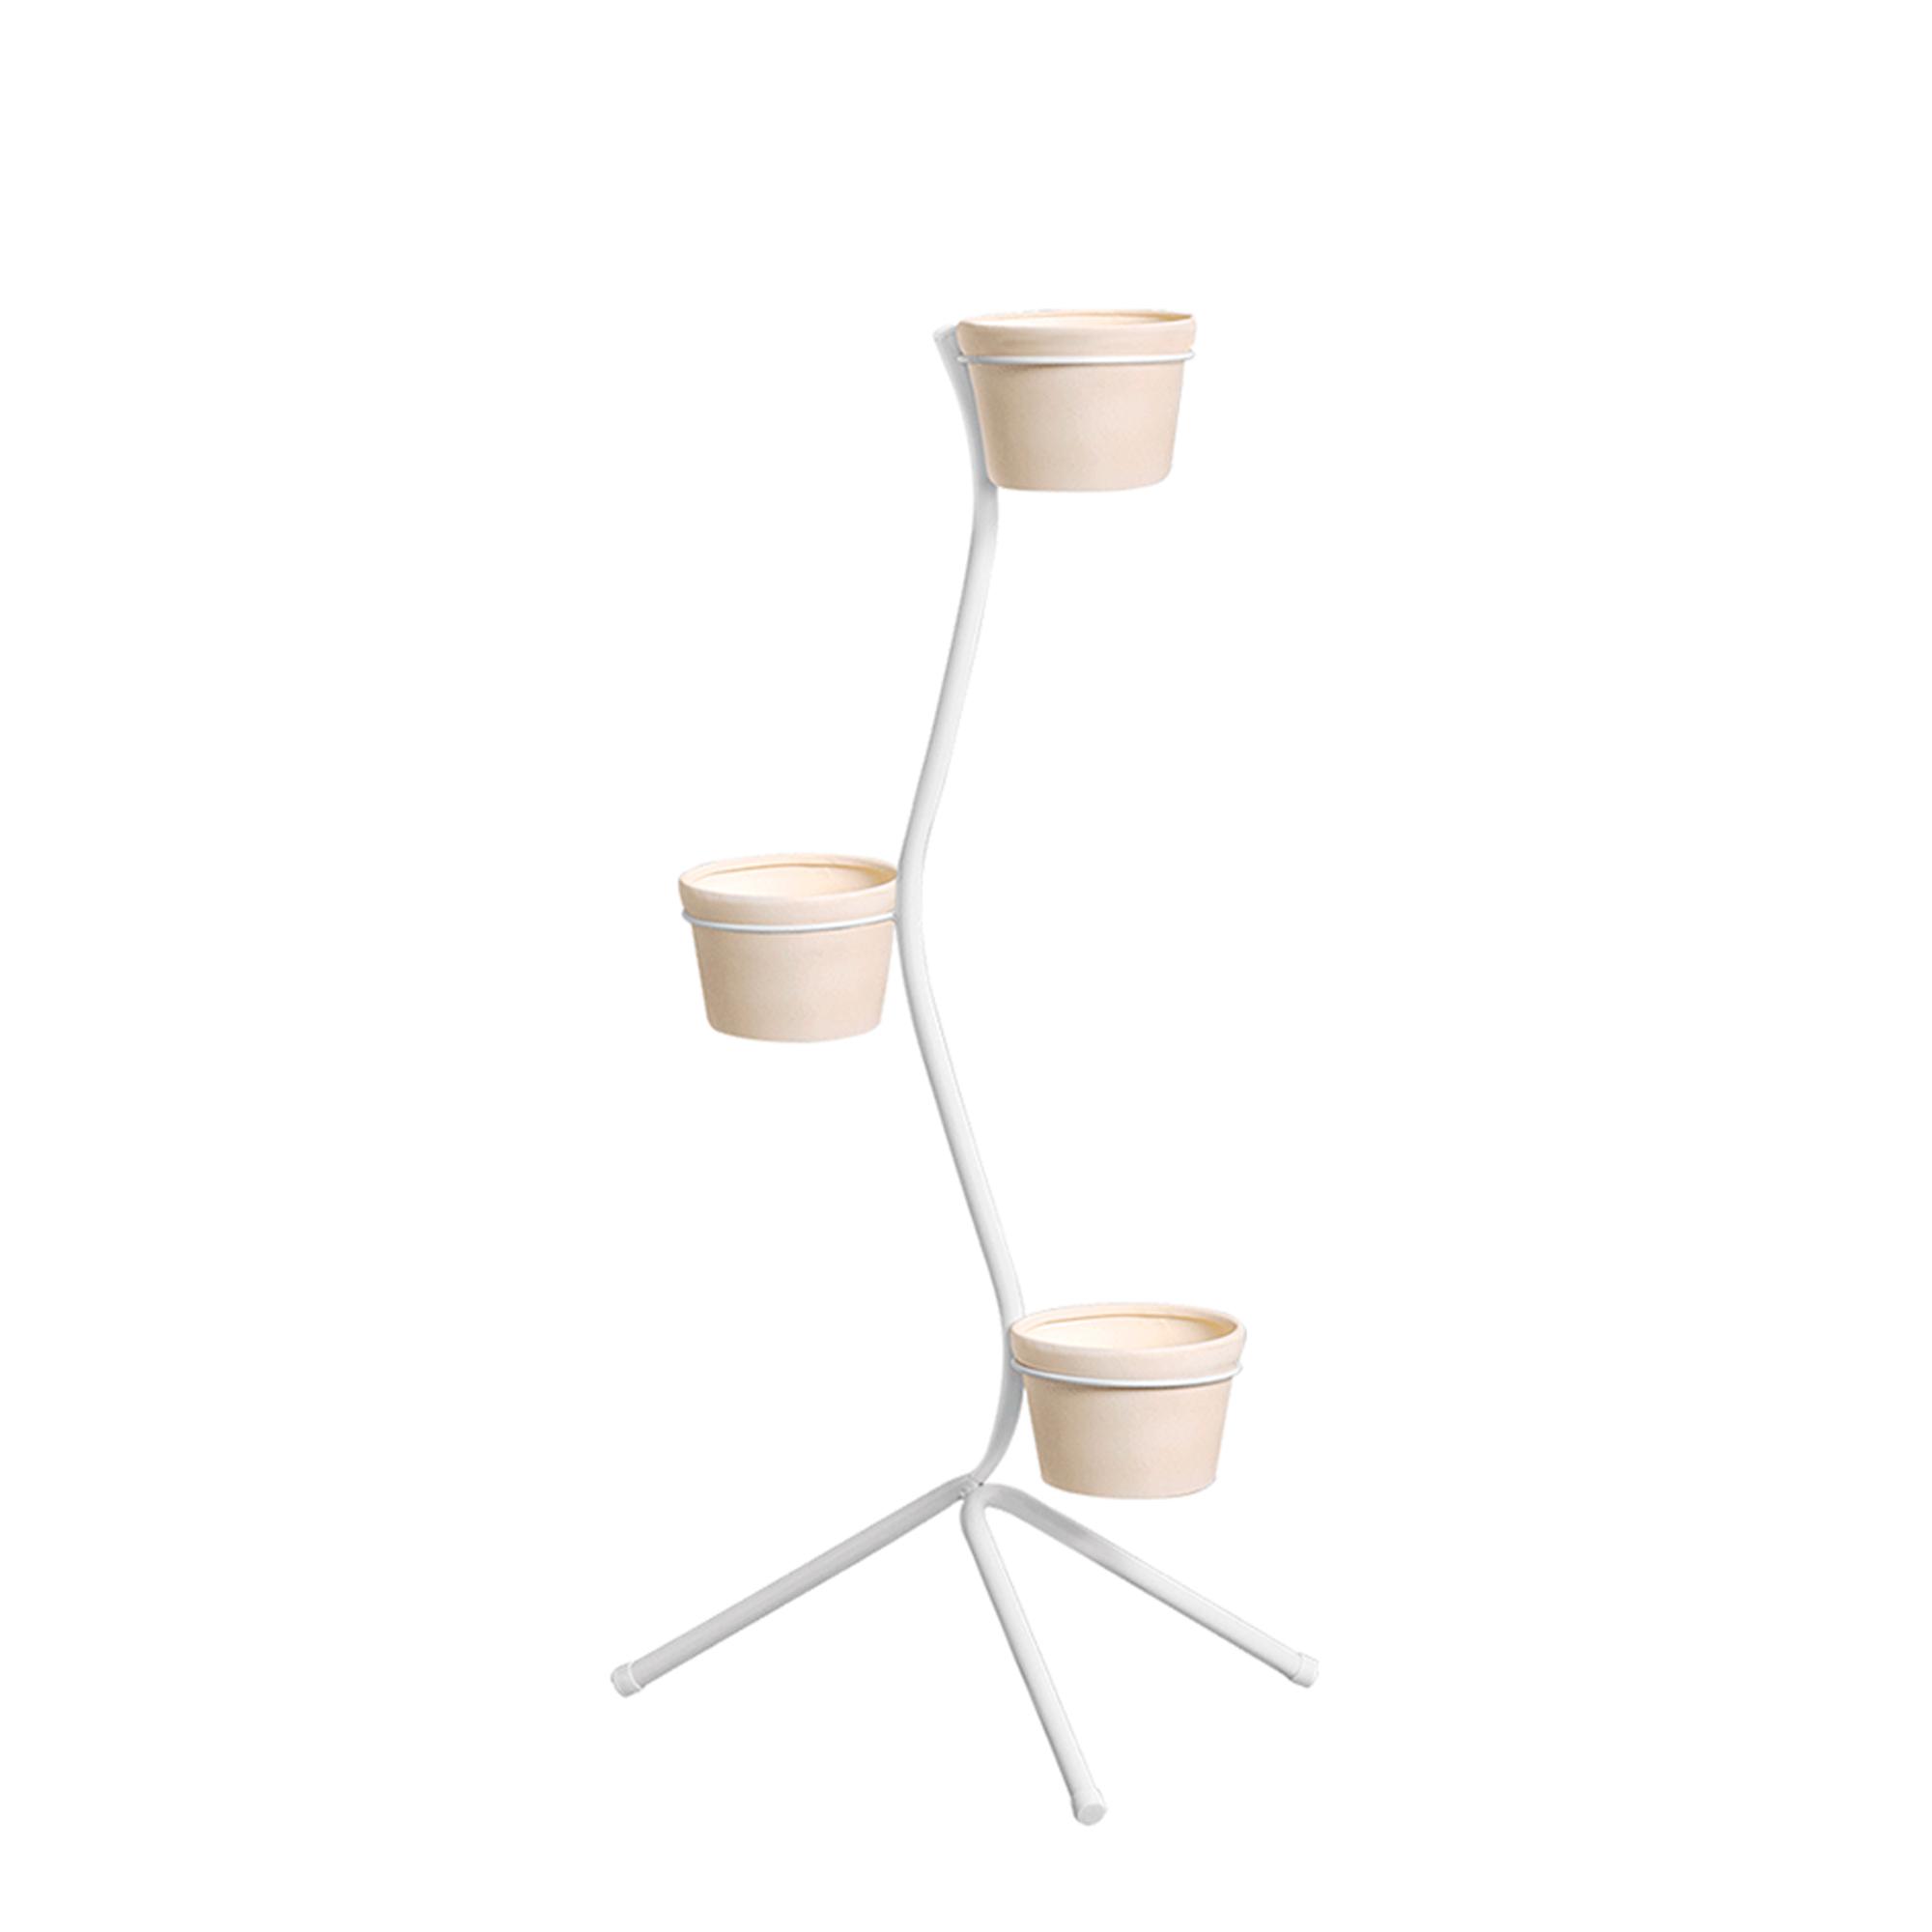 Aspiral Chão c/ 3 Vasos Redondo